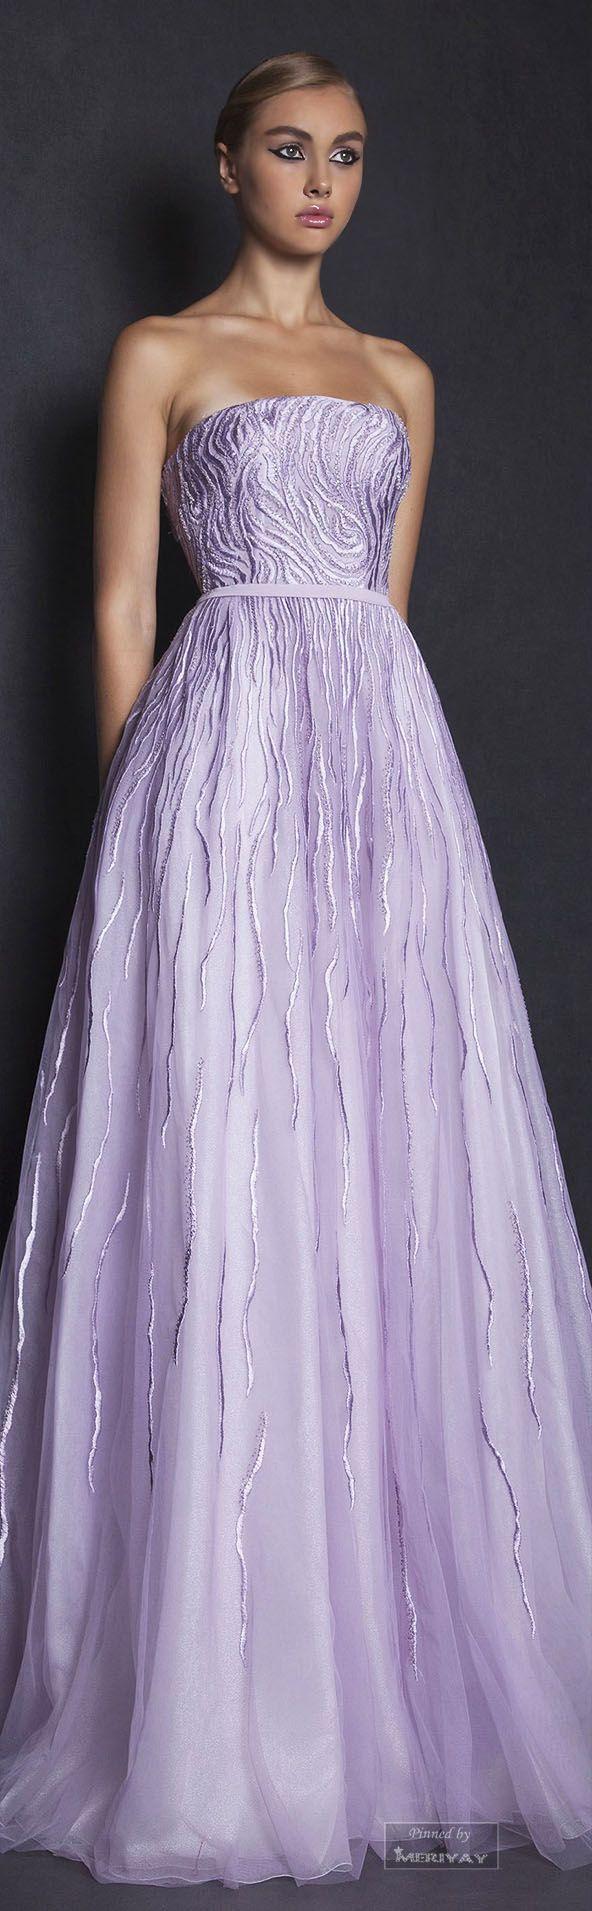 shoulder handbags Tony Ward Spring-summer 2015. | Dress Me Up |  | Tony Ward, Lilac Wedding Dresses and Lilac Wedding